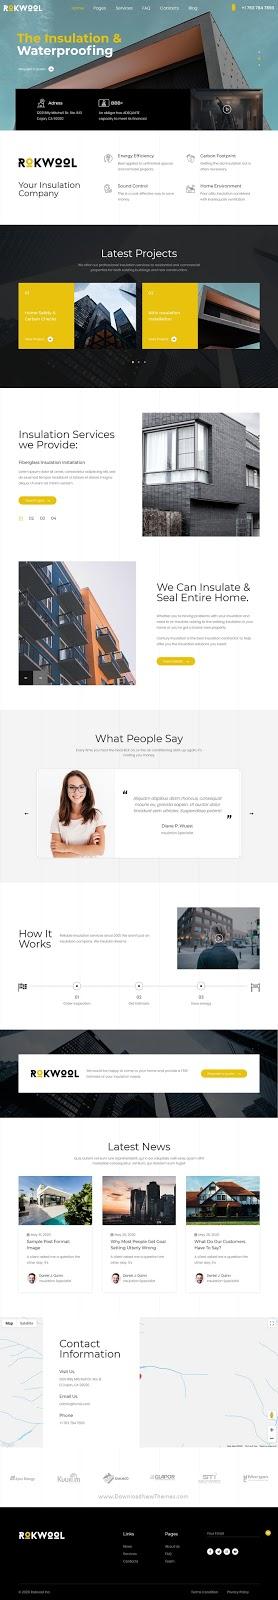 Premium WordPress theme for House Insulation